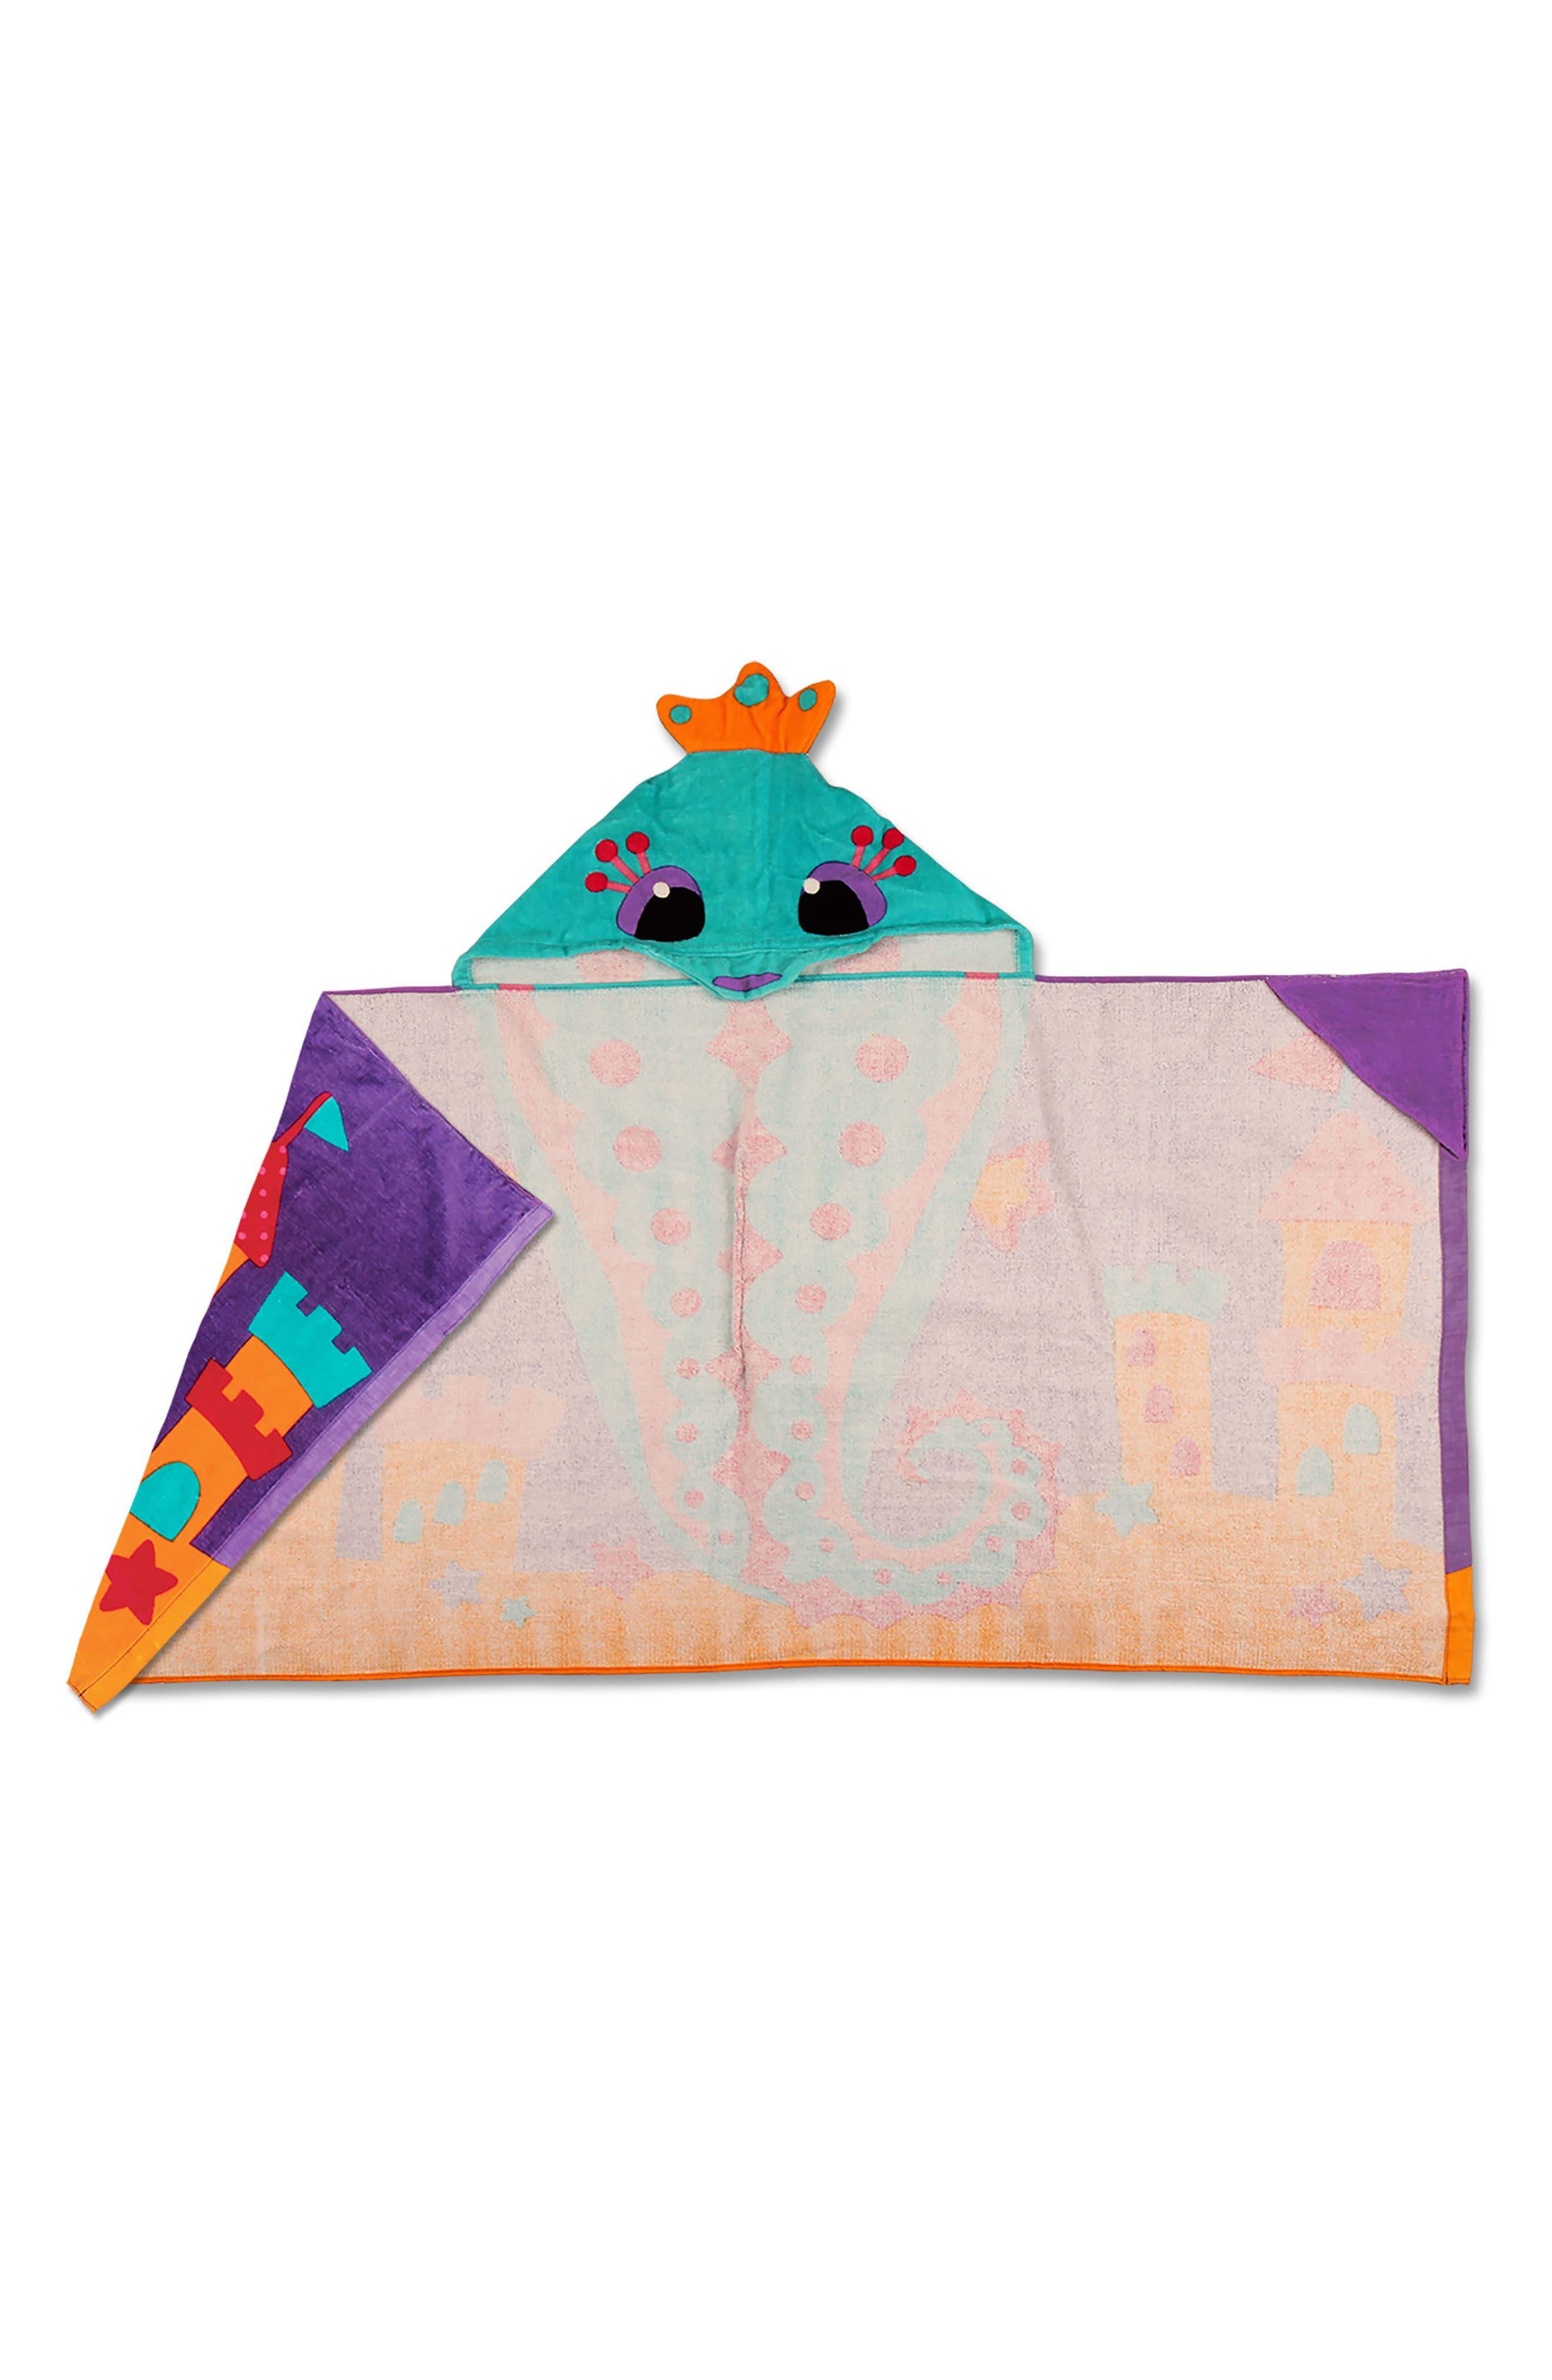 STEPHEN JOSEPH,                             Wet/Dry Bag, Hooded Towel & Goggles,                             Alternate thumbnail 7, color,                             PURPLE SEAHORSE